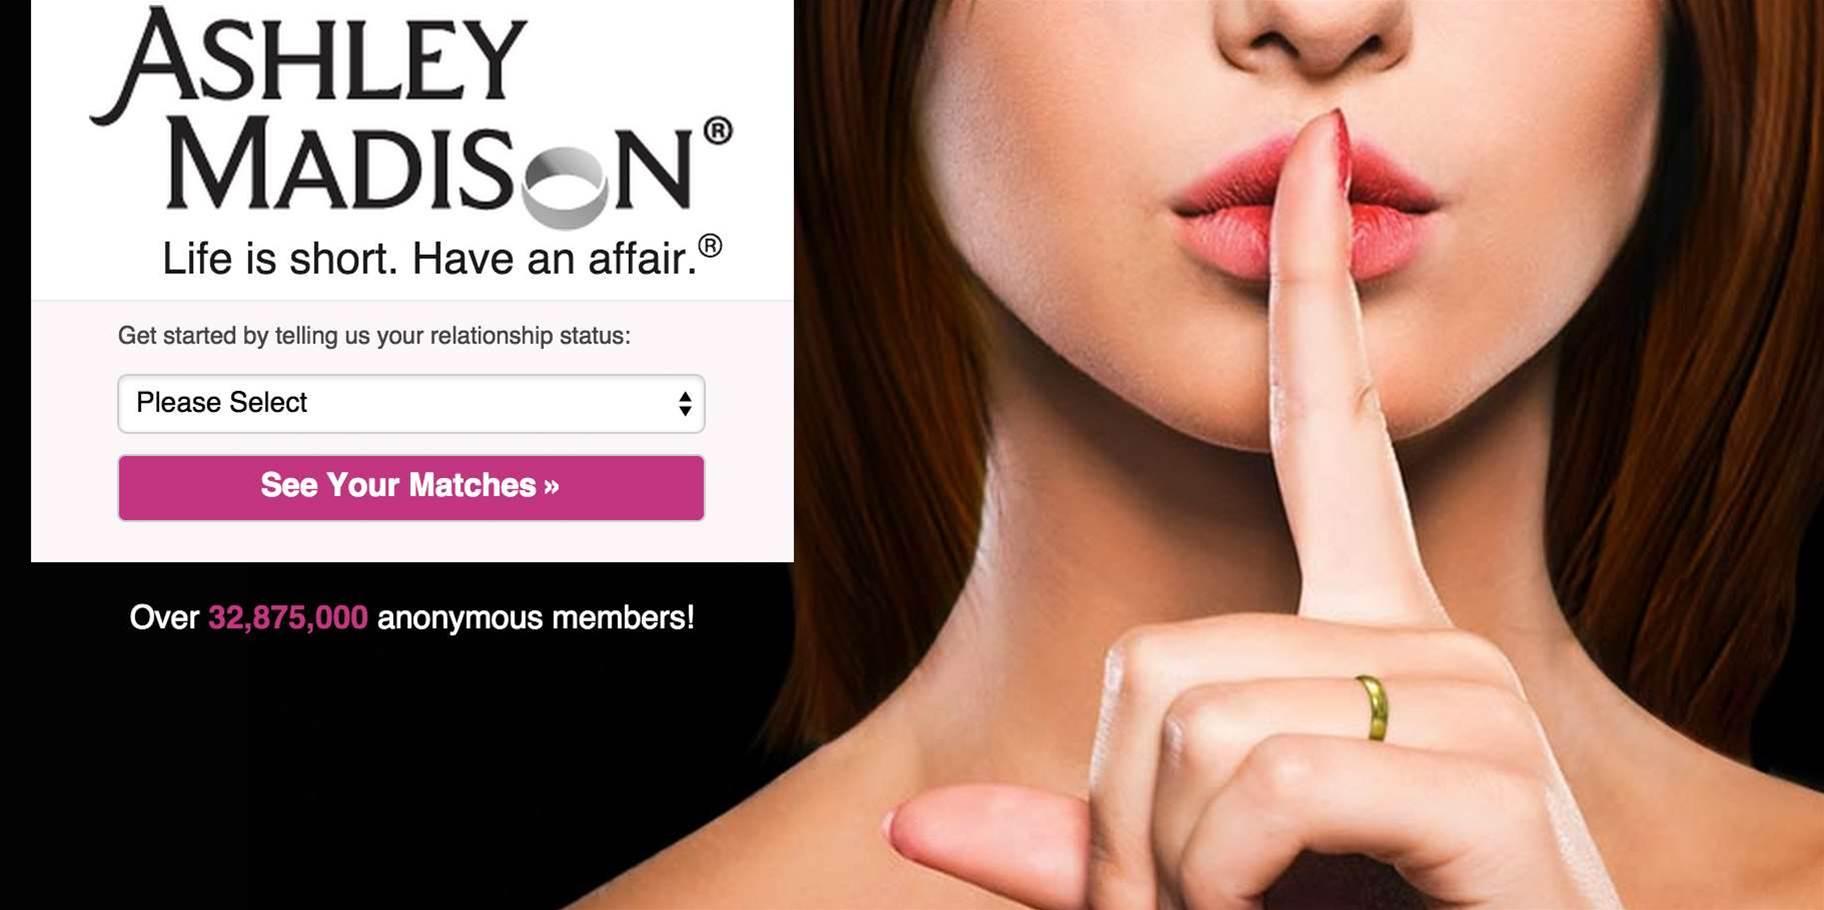 Australian Privacy Commissioner investigates Ashley Madison hack